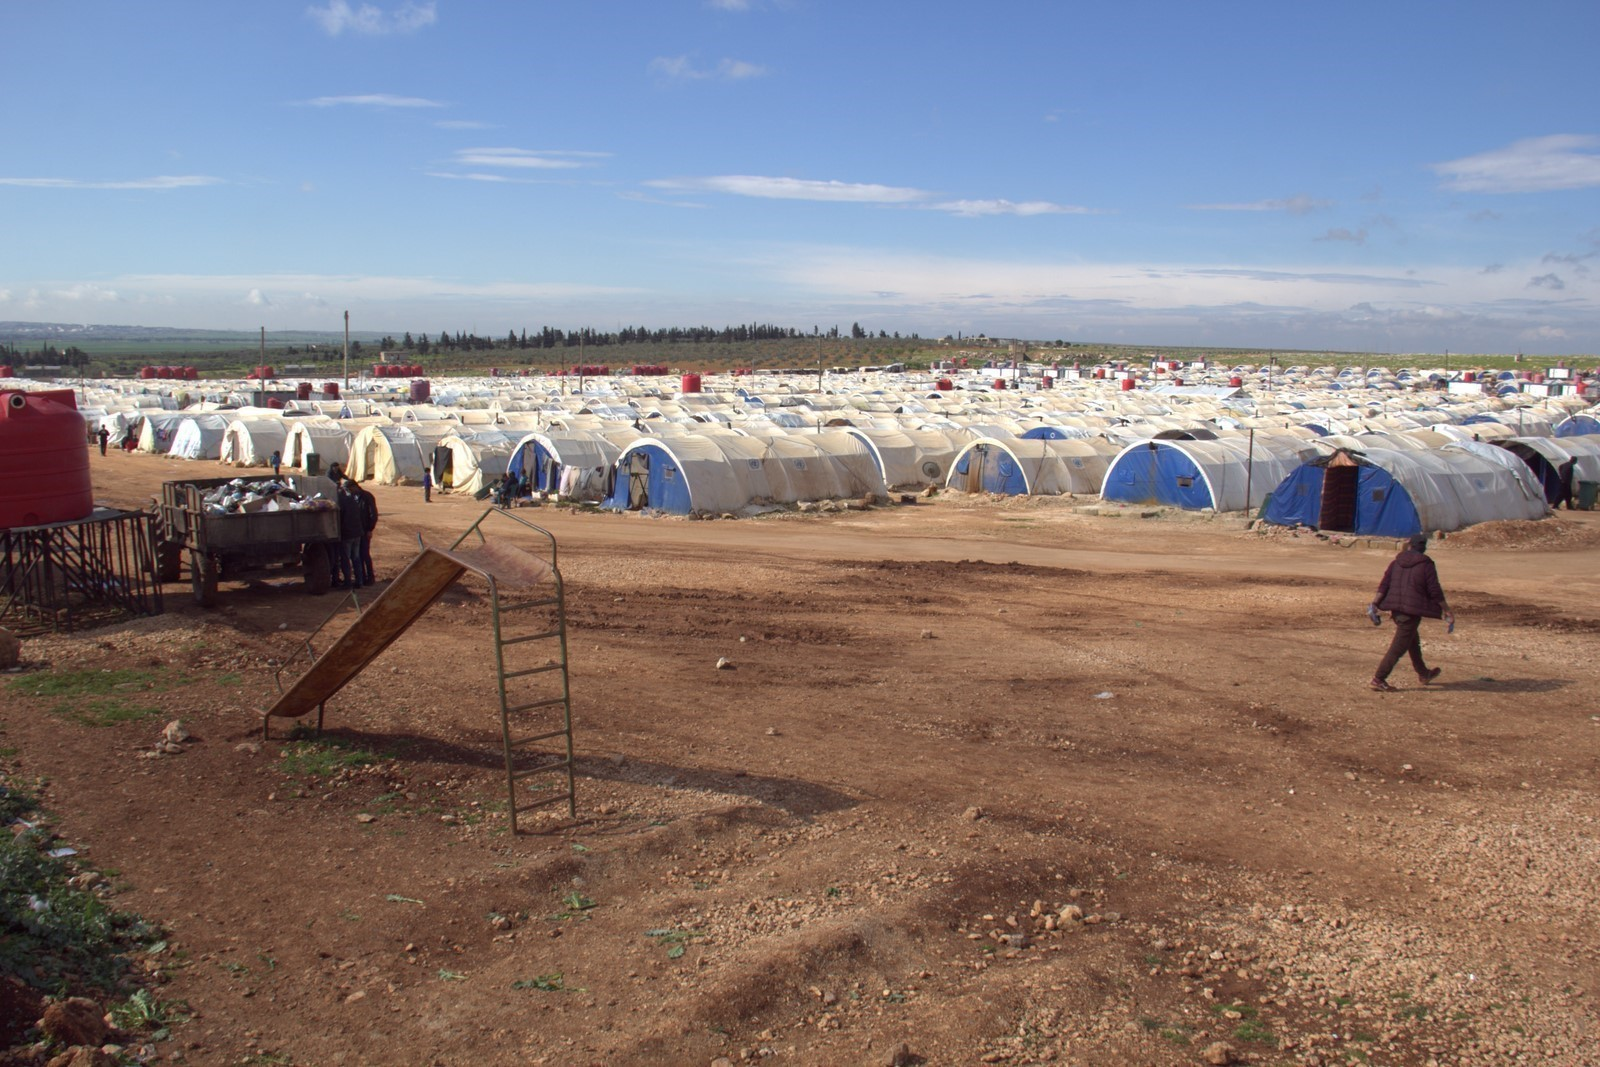 Berxwedan camp: one year and resistance continues